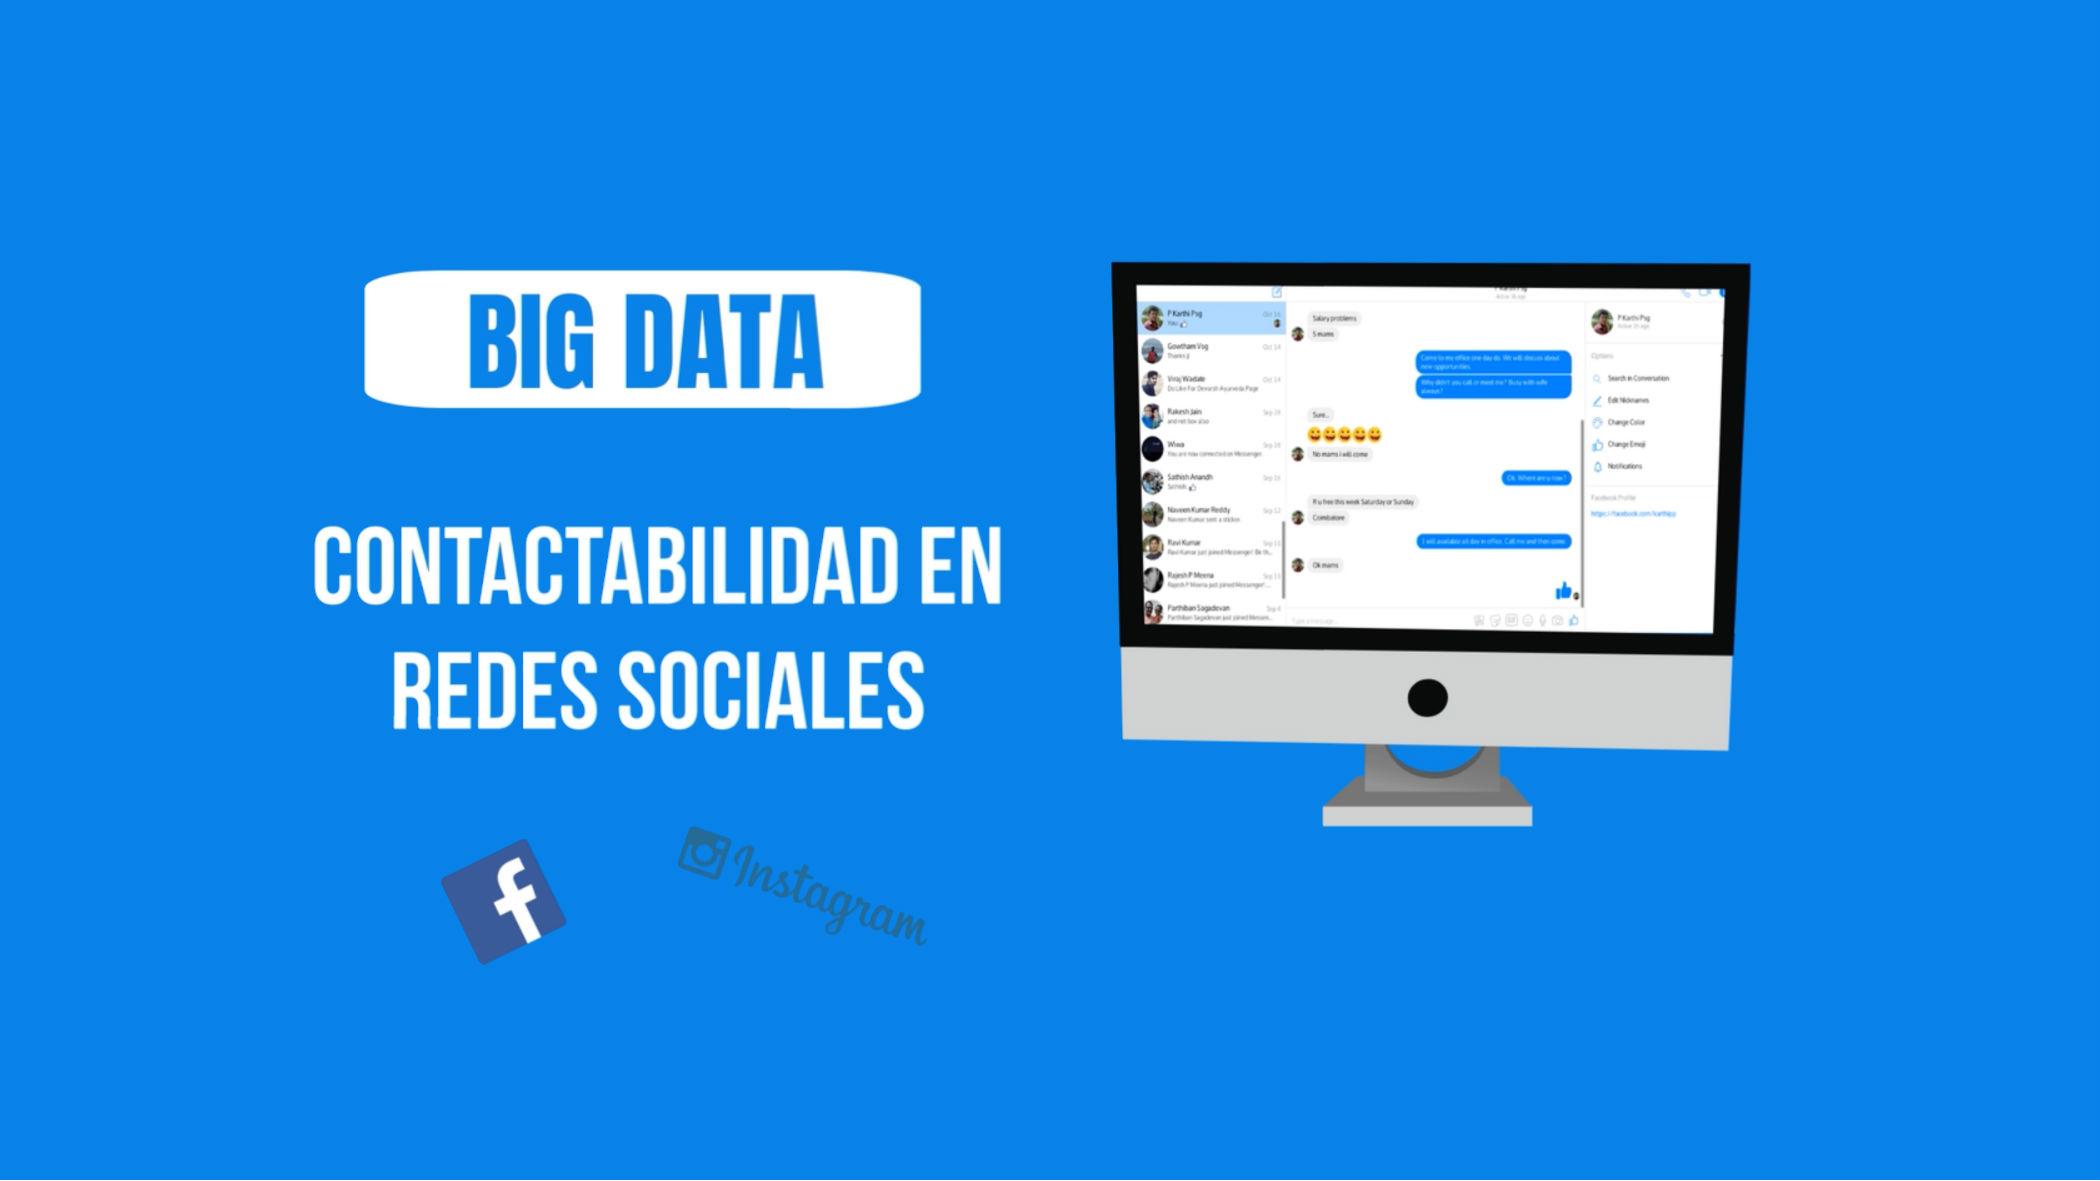 Bases de Datos de Tus Contactos en Redes Sociales Asociados a un Rut